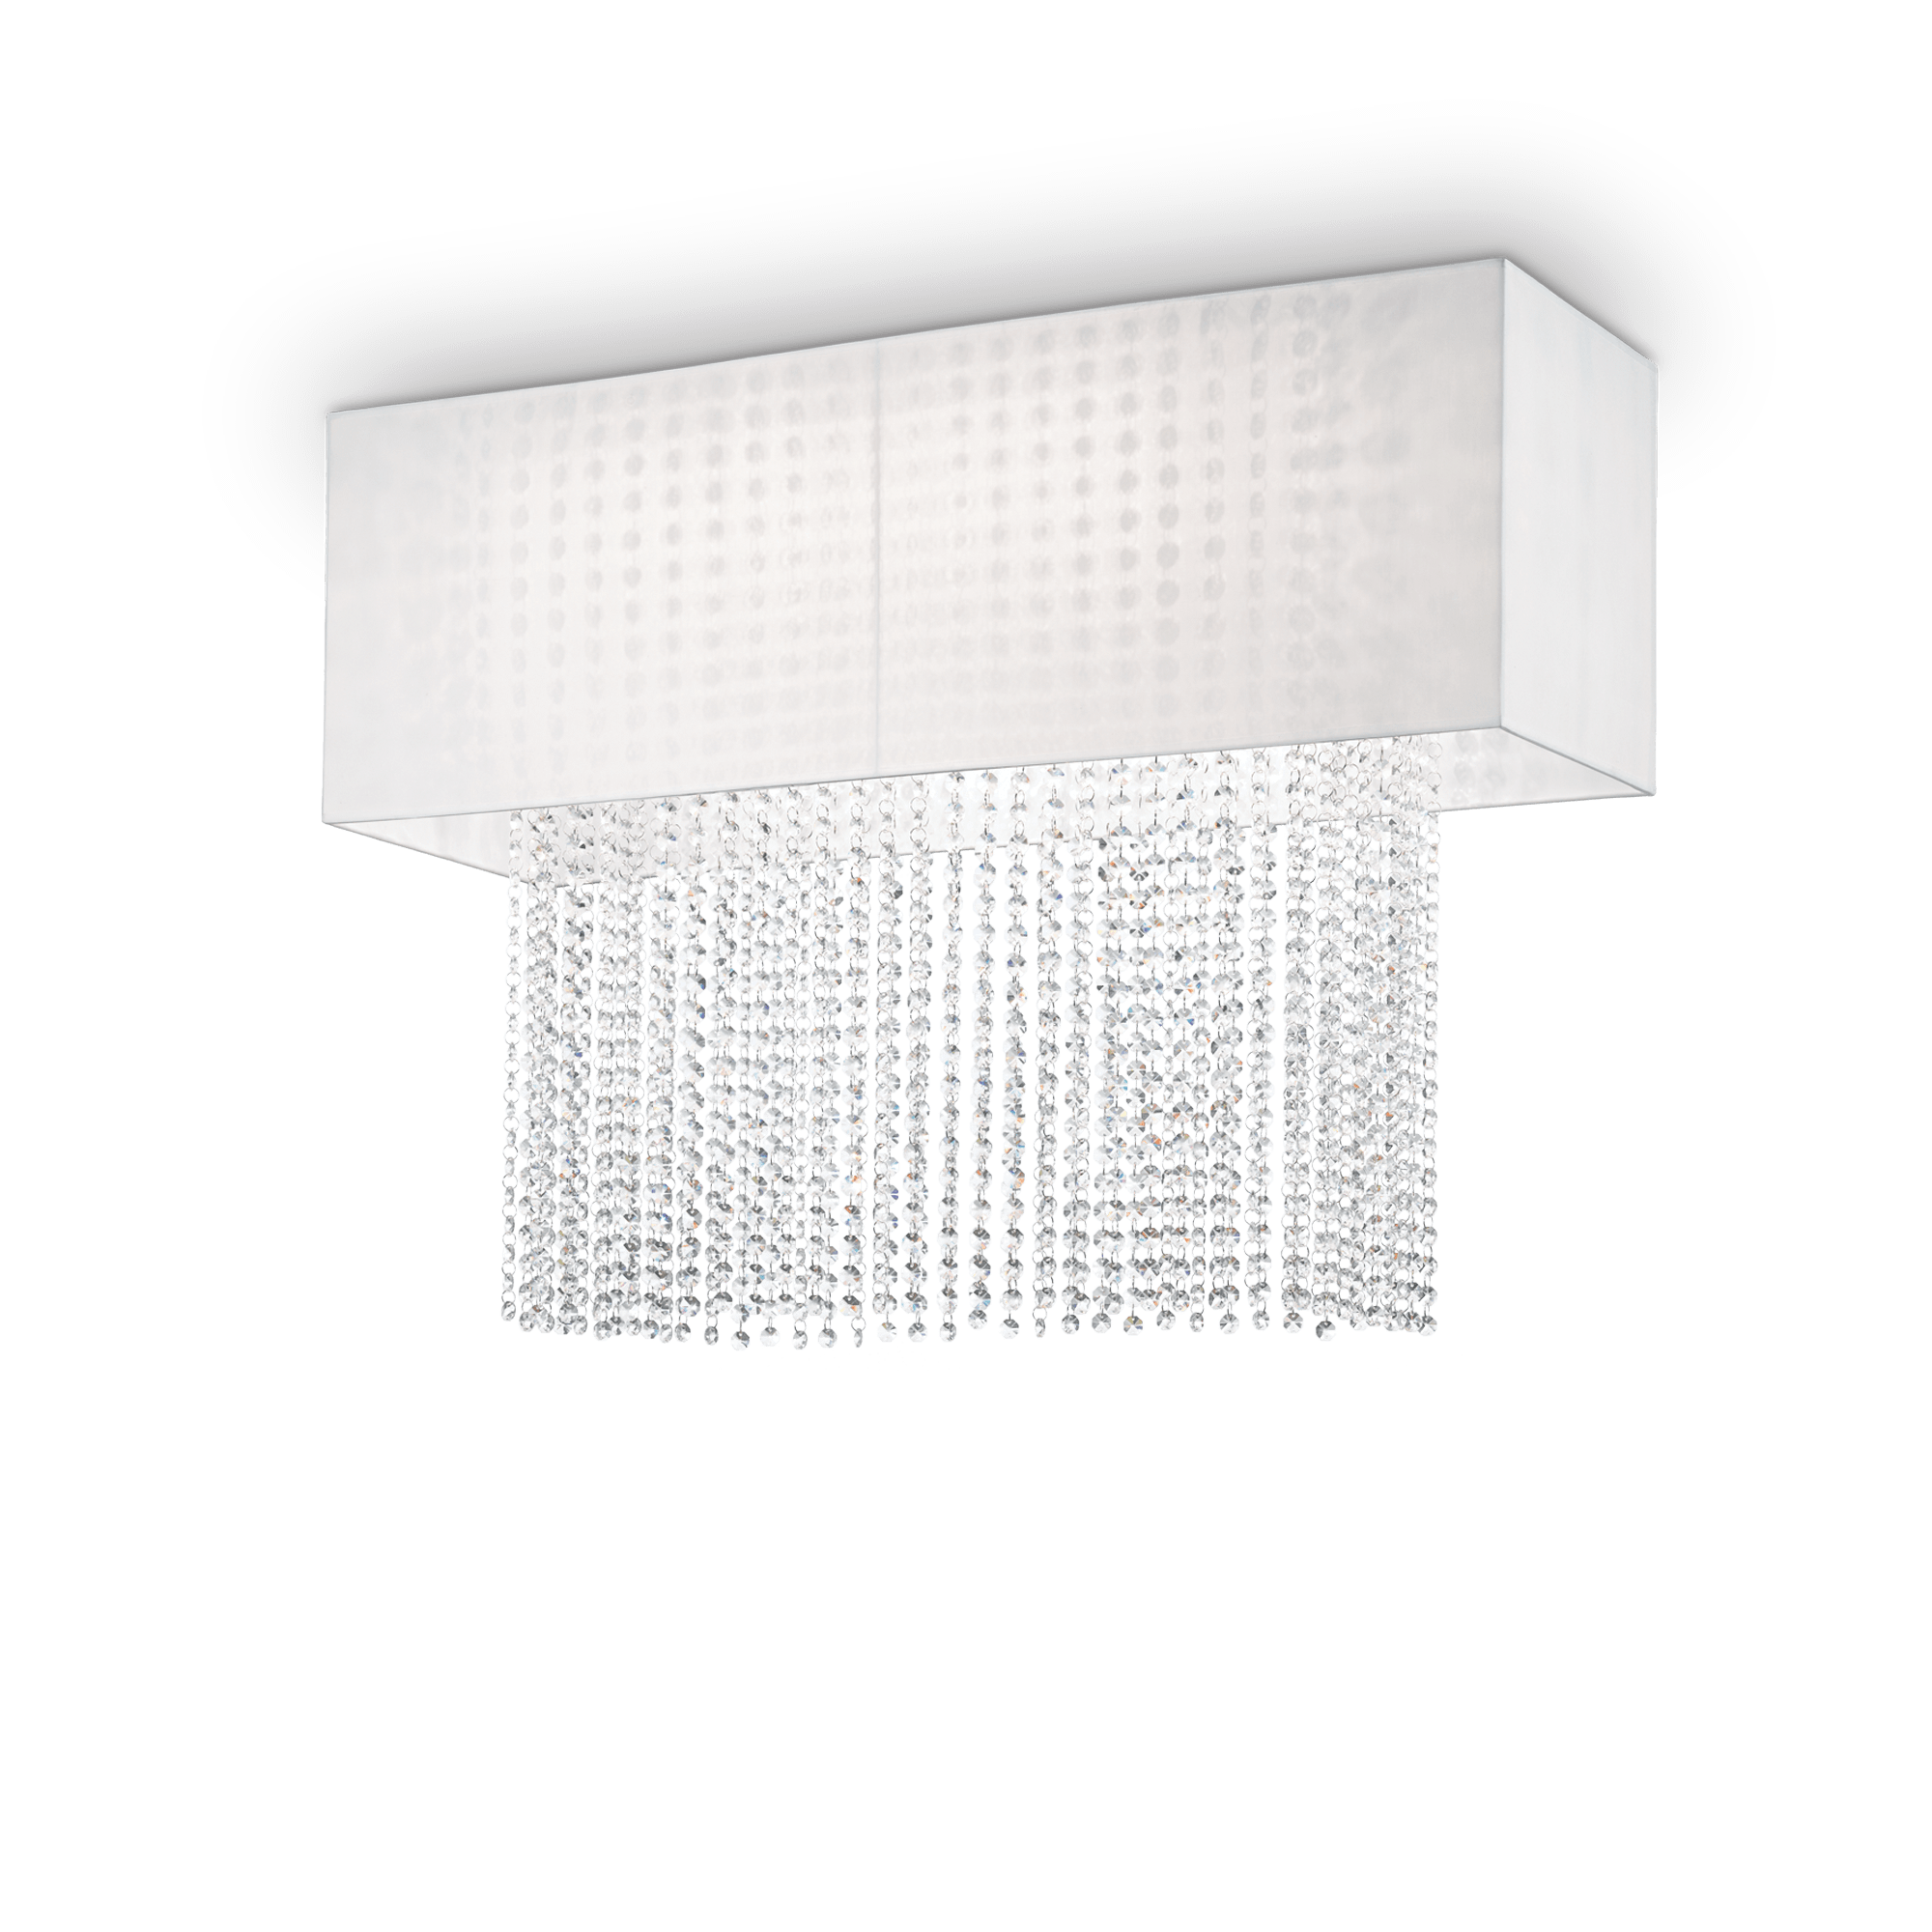 Потолочная люстра Ideal Lux PHOENIX PL5 BIANCO 099118, 5xE27x60W, хром, белый, прозрачный, металл, текстиль, хрусталь - фото 1